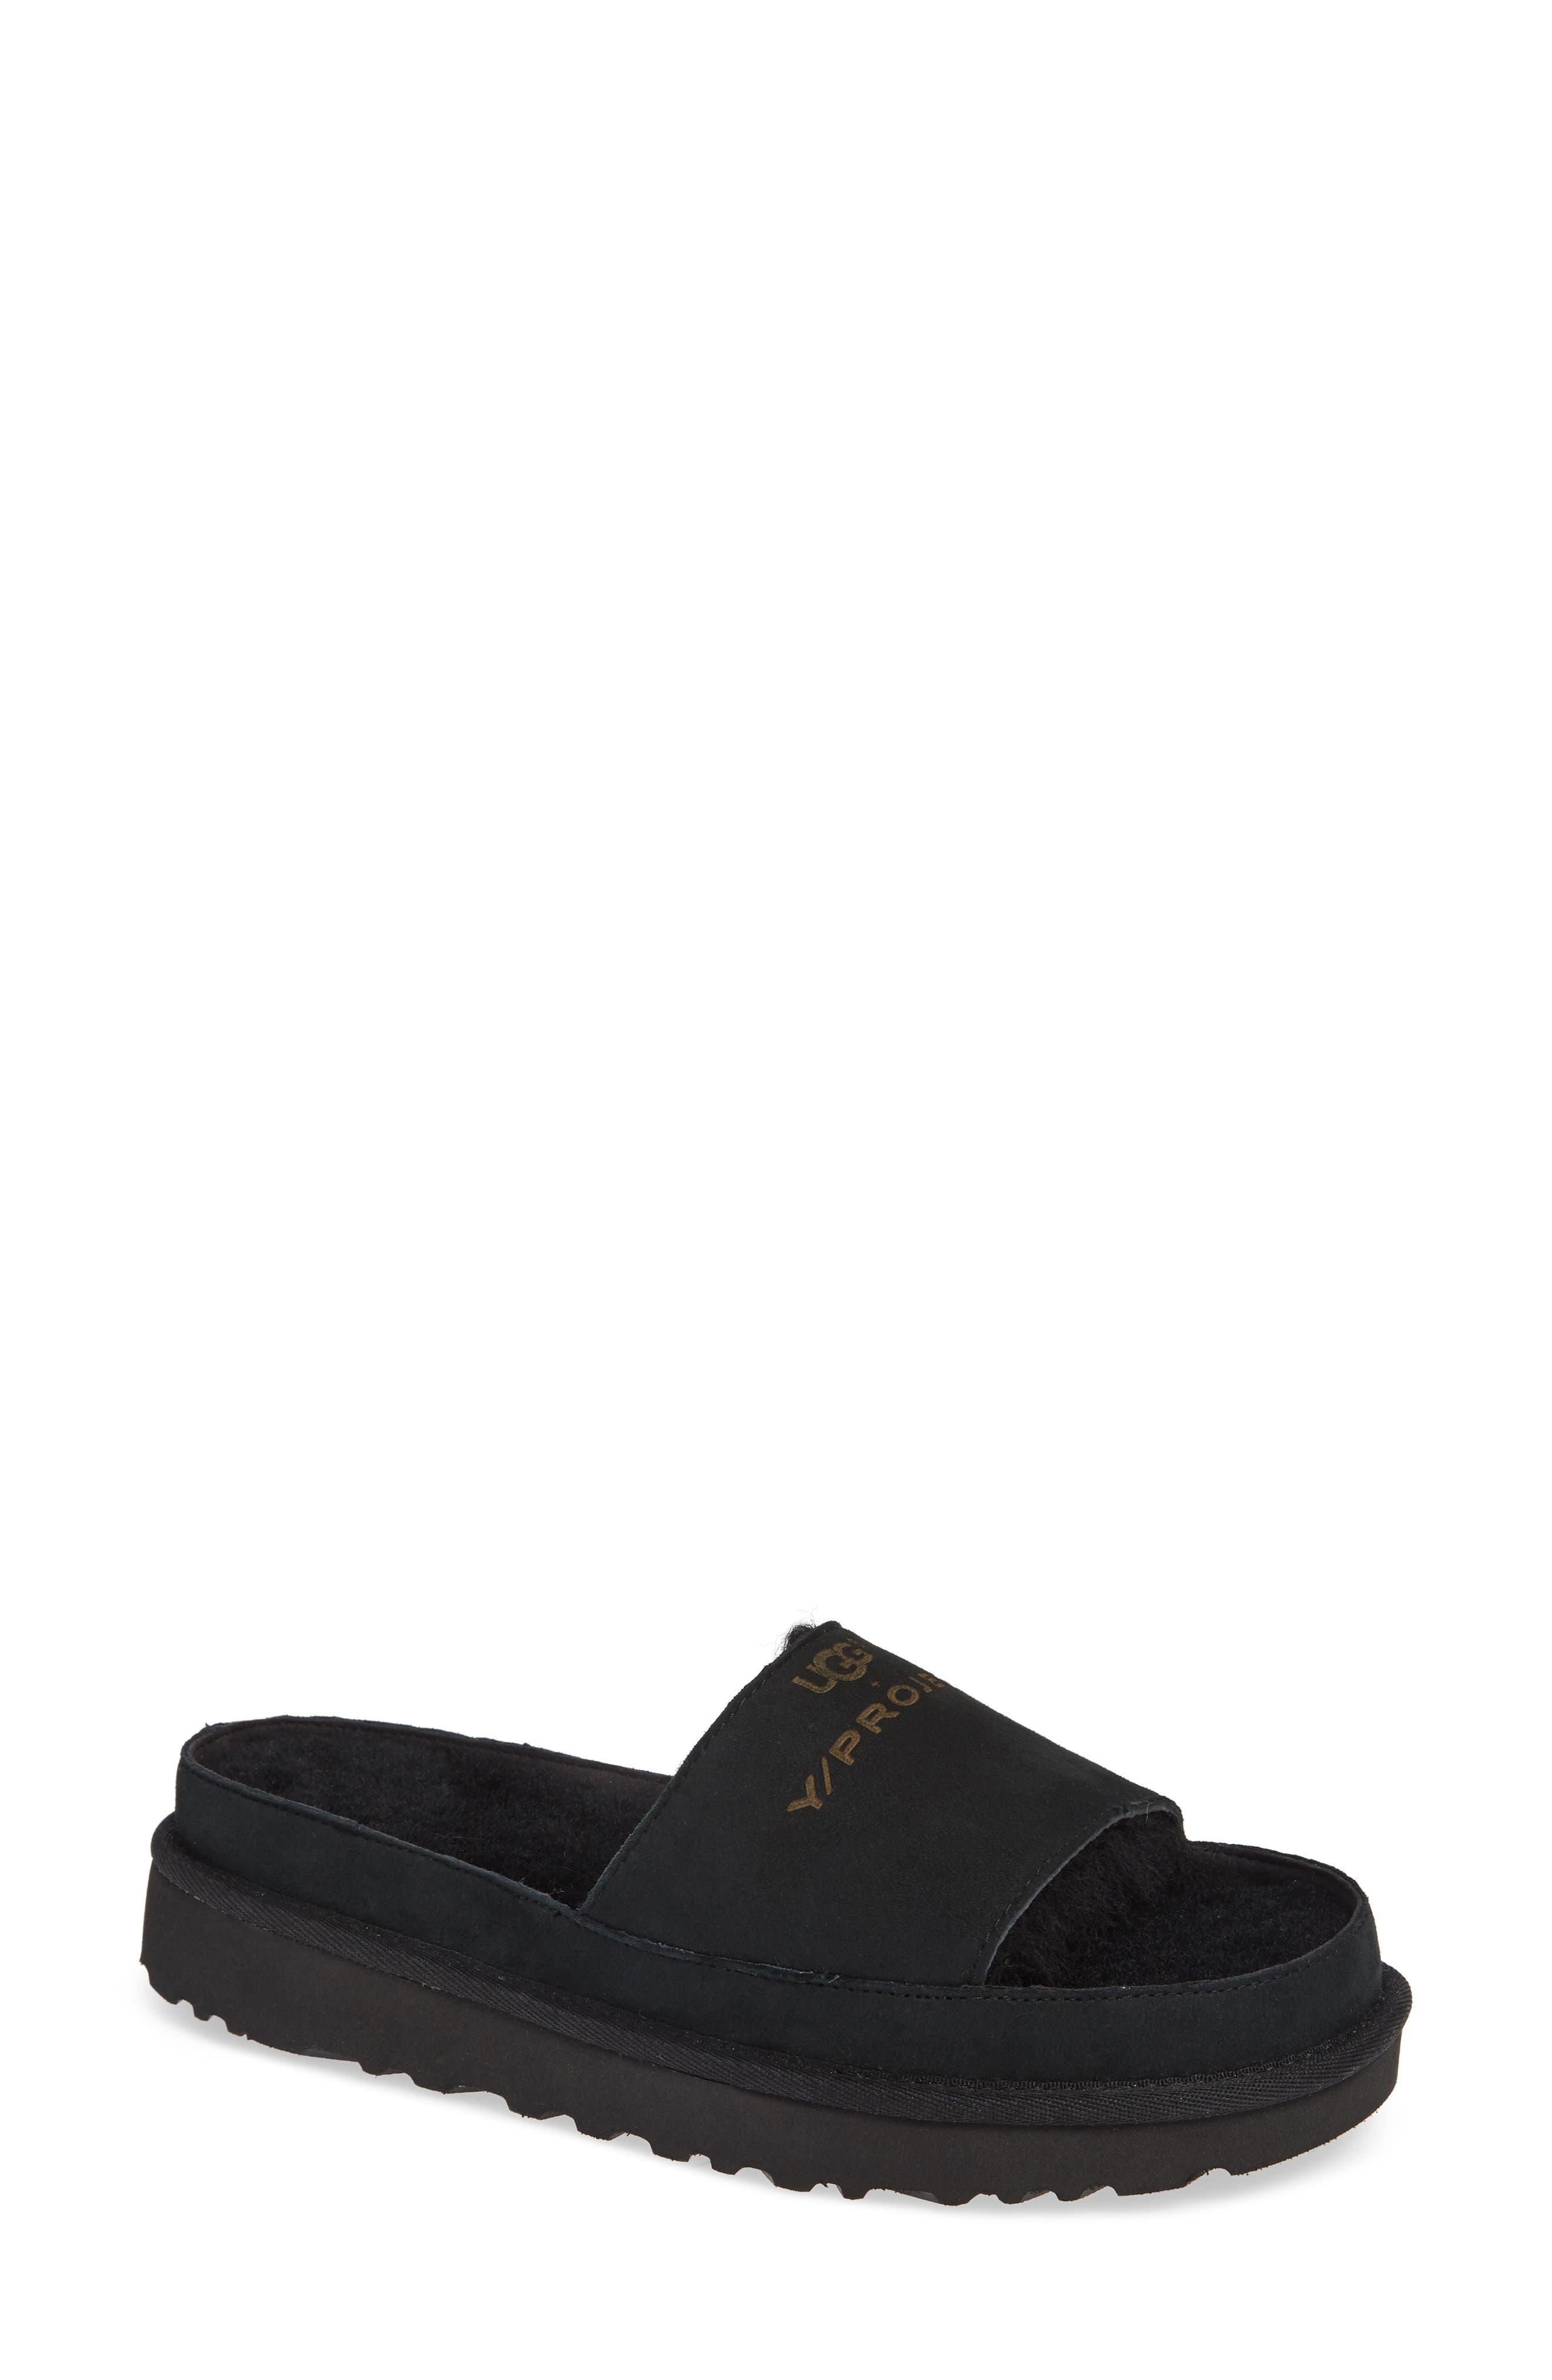 x UGG<sup>®</sup> Genuine Shearling Slide Sandal, Main, color, 001